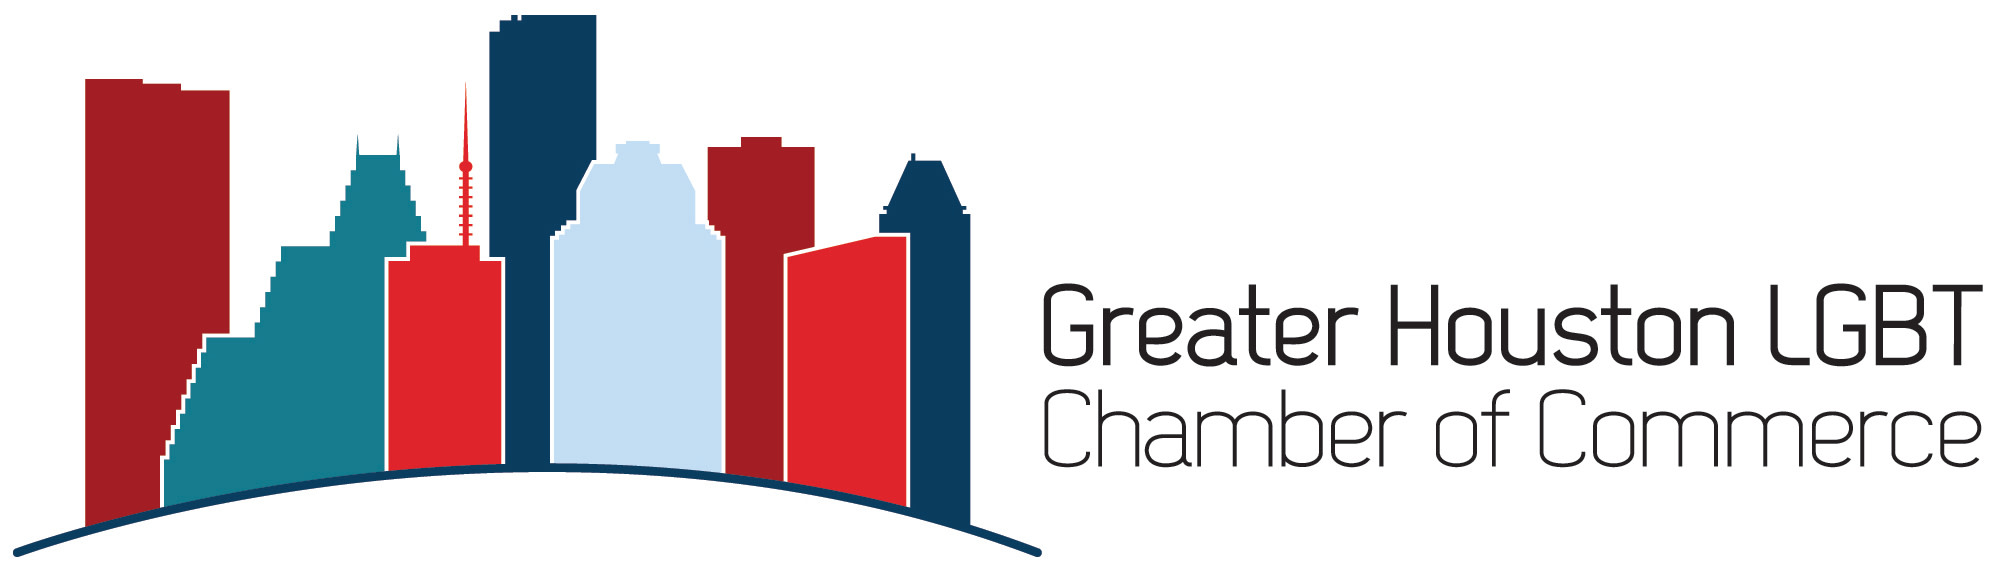 Greater Houston LGBT Chamber of Commerce